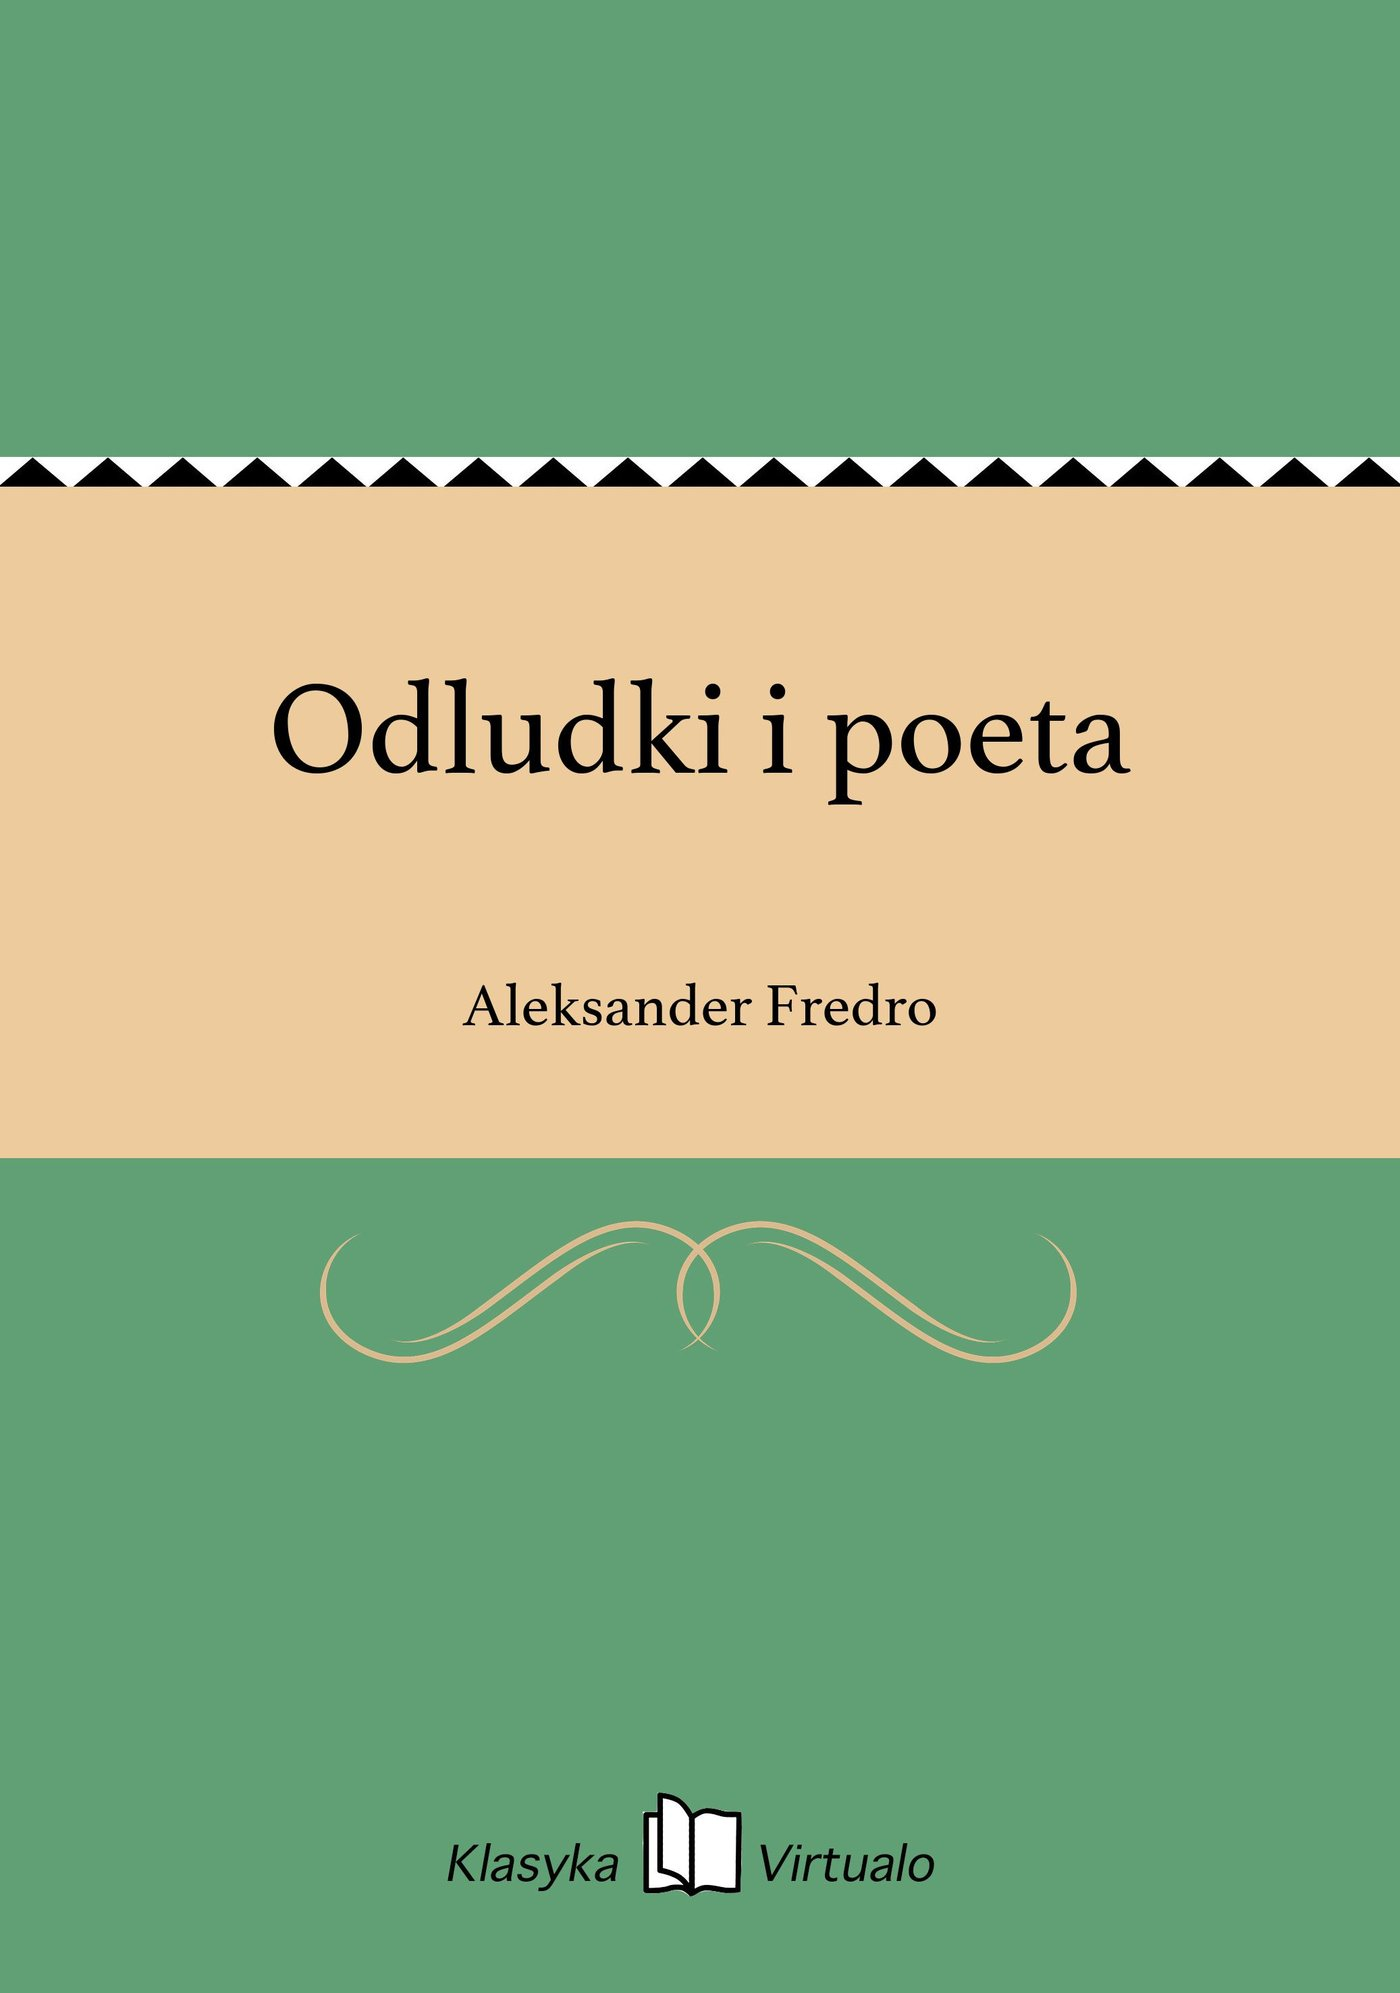 Odludki i poeta - Ebook (Książka na Kindle) do pobrania w formacie MOBI